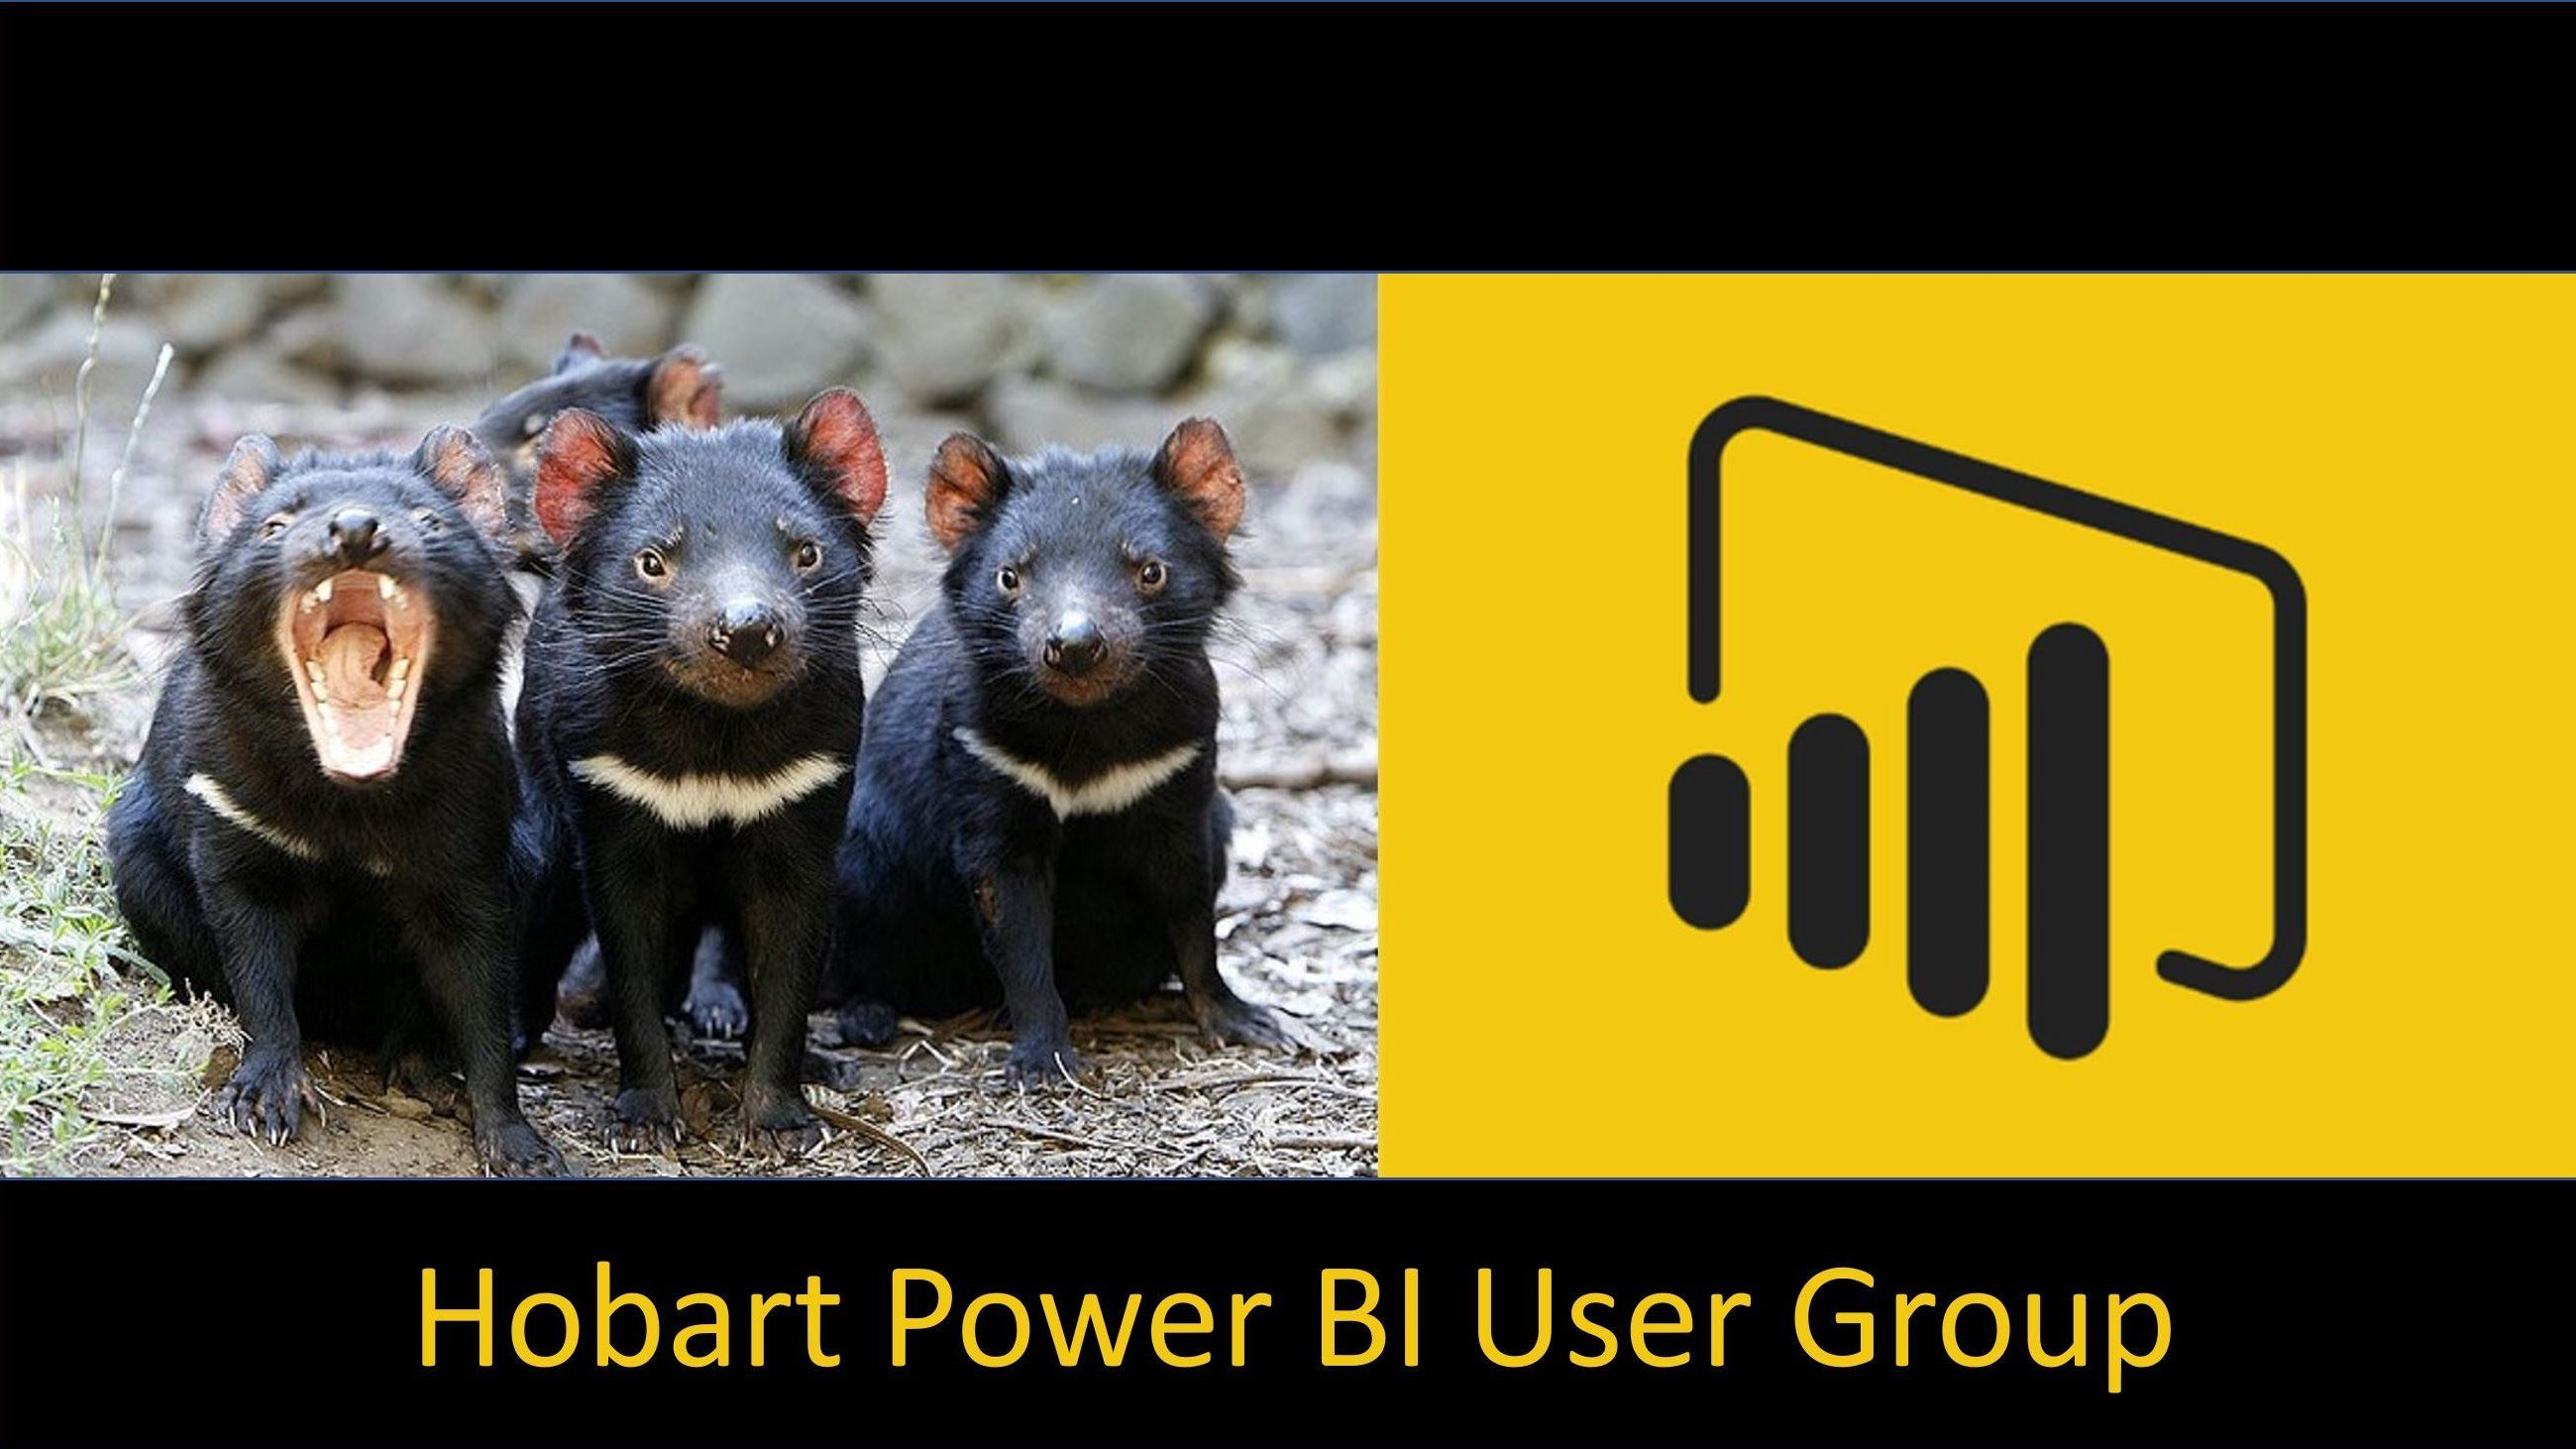 Hobart Power BI User Group